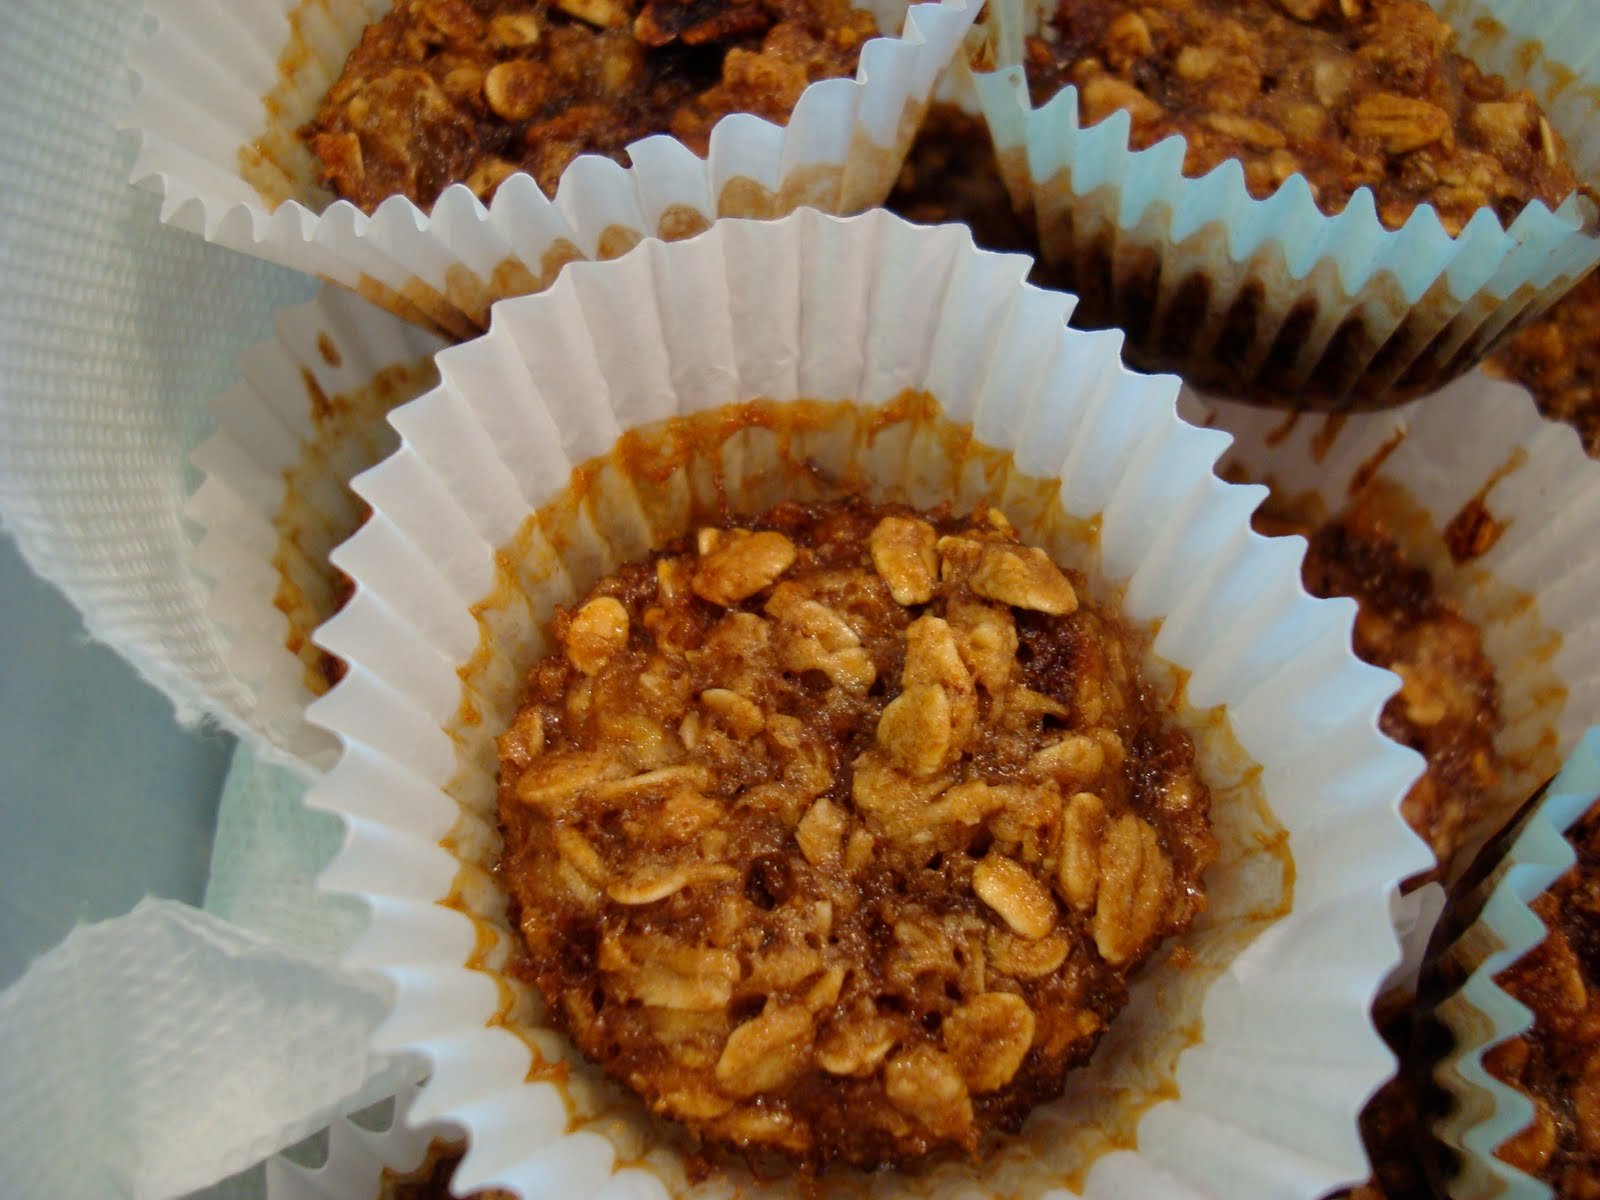 Banana Oatmeal Raisin Muffins Recipes — Dishmaps